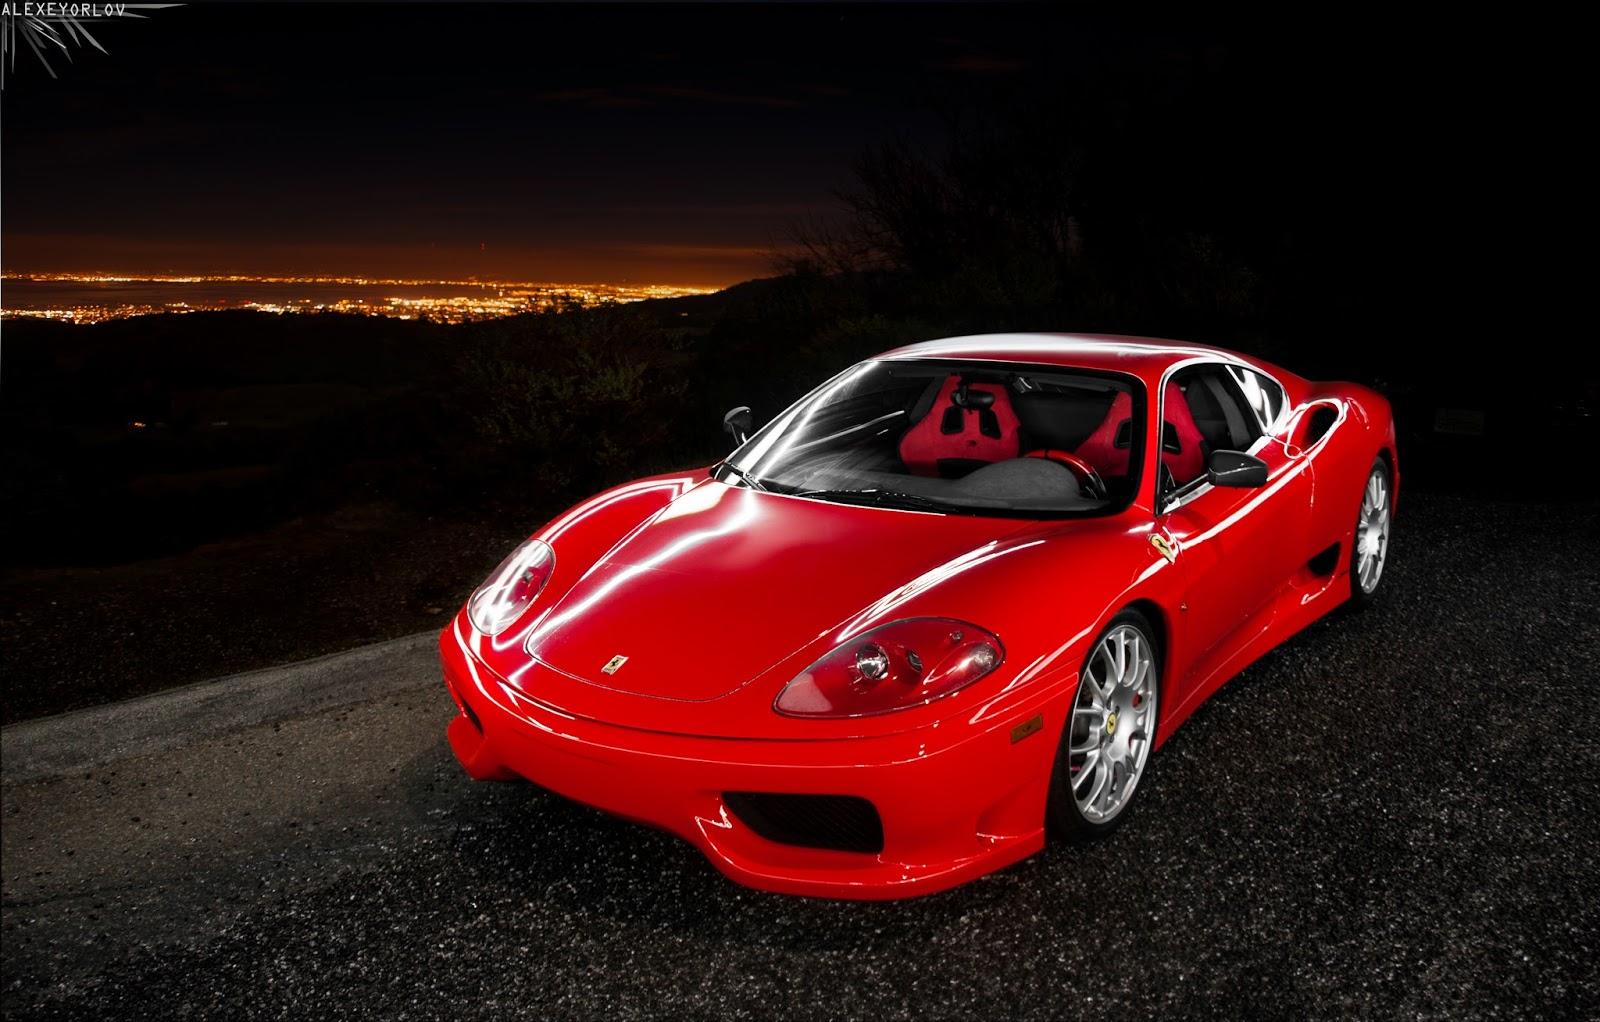 front 10 λόγοι που η Ferrari 360 Challenge Stradale ανήκει στο γκαράζ των ονείρων μας Ferrari, Ferrari 360 Challenge Stradale, Ferrari 360 Modena, Ferrari Challenge Stradale, videos